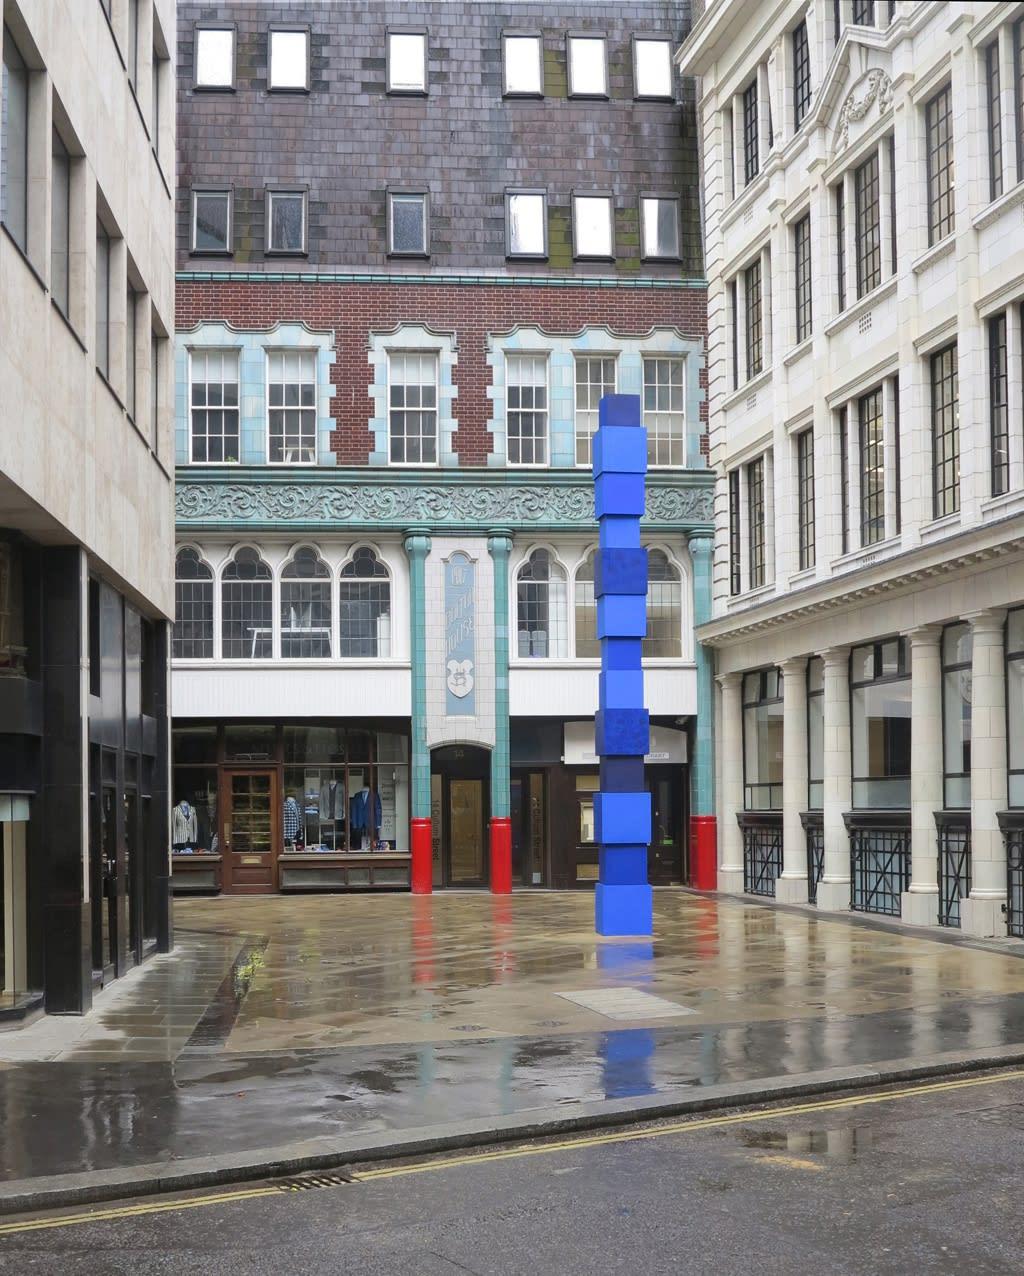 Sculpture in the City, London (2016) Photo: Jürgen Partenheimer